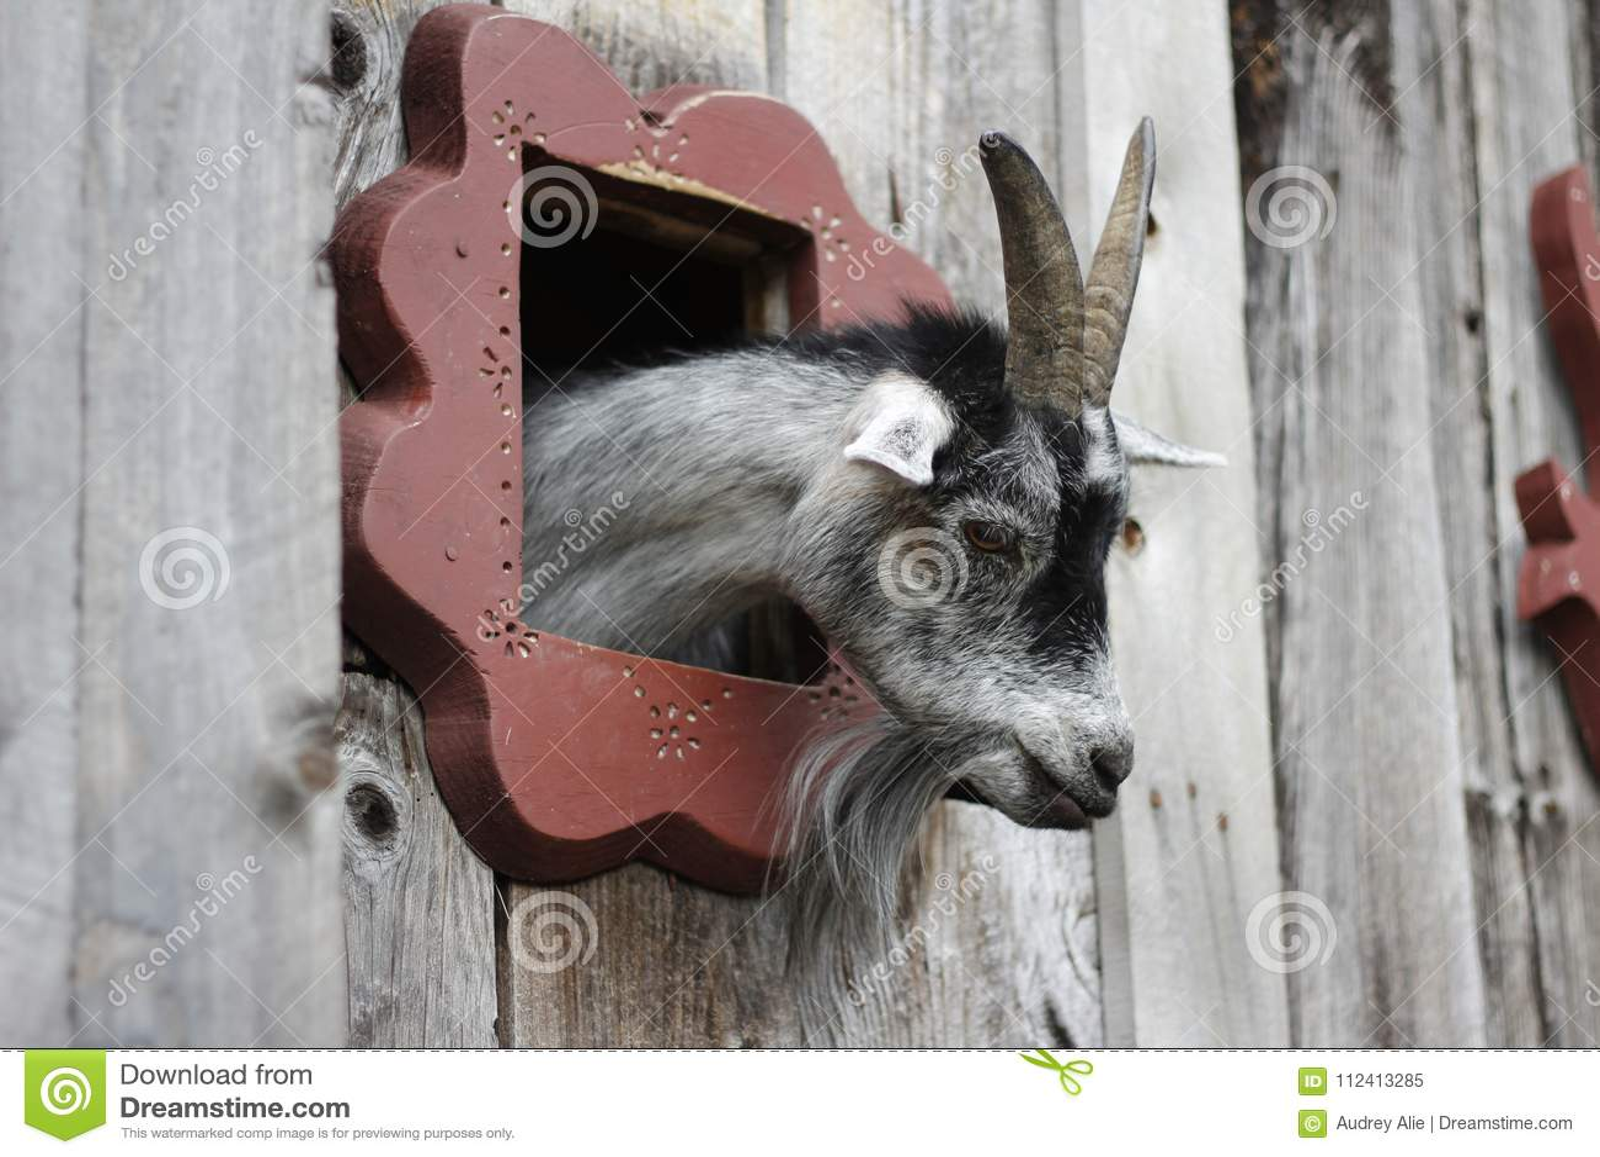 Goat peek-a-boo